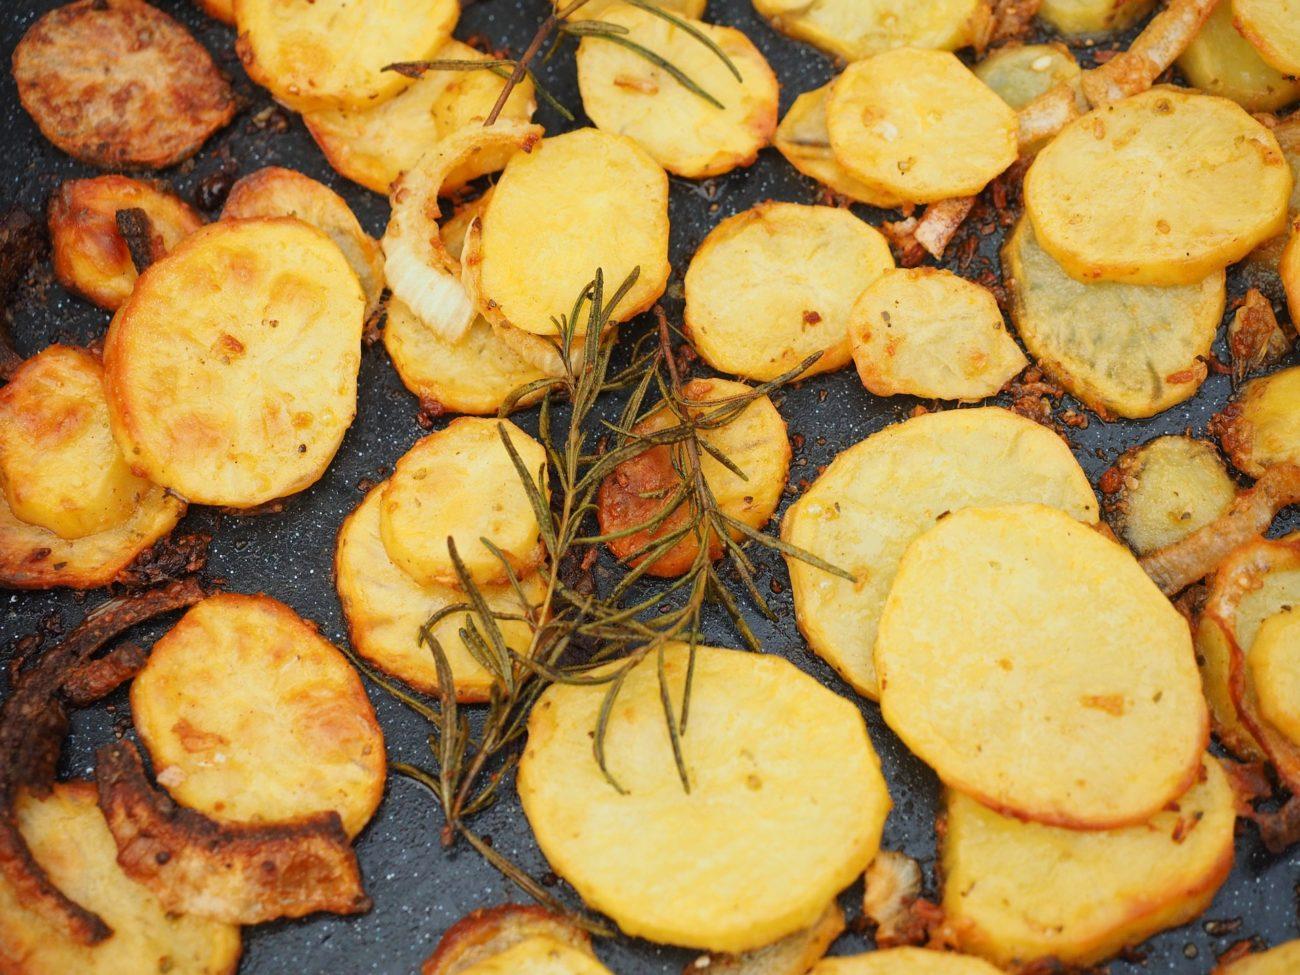 Lionas kartupeļi